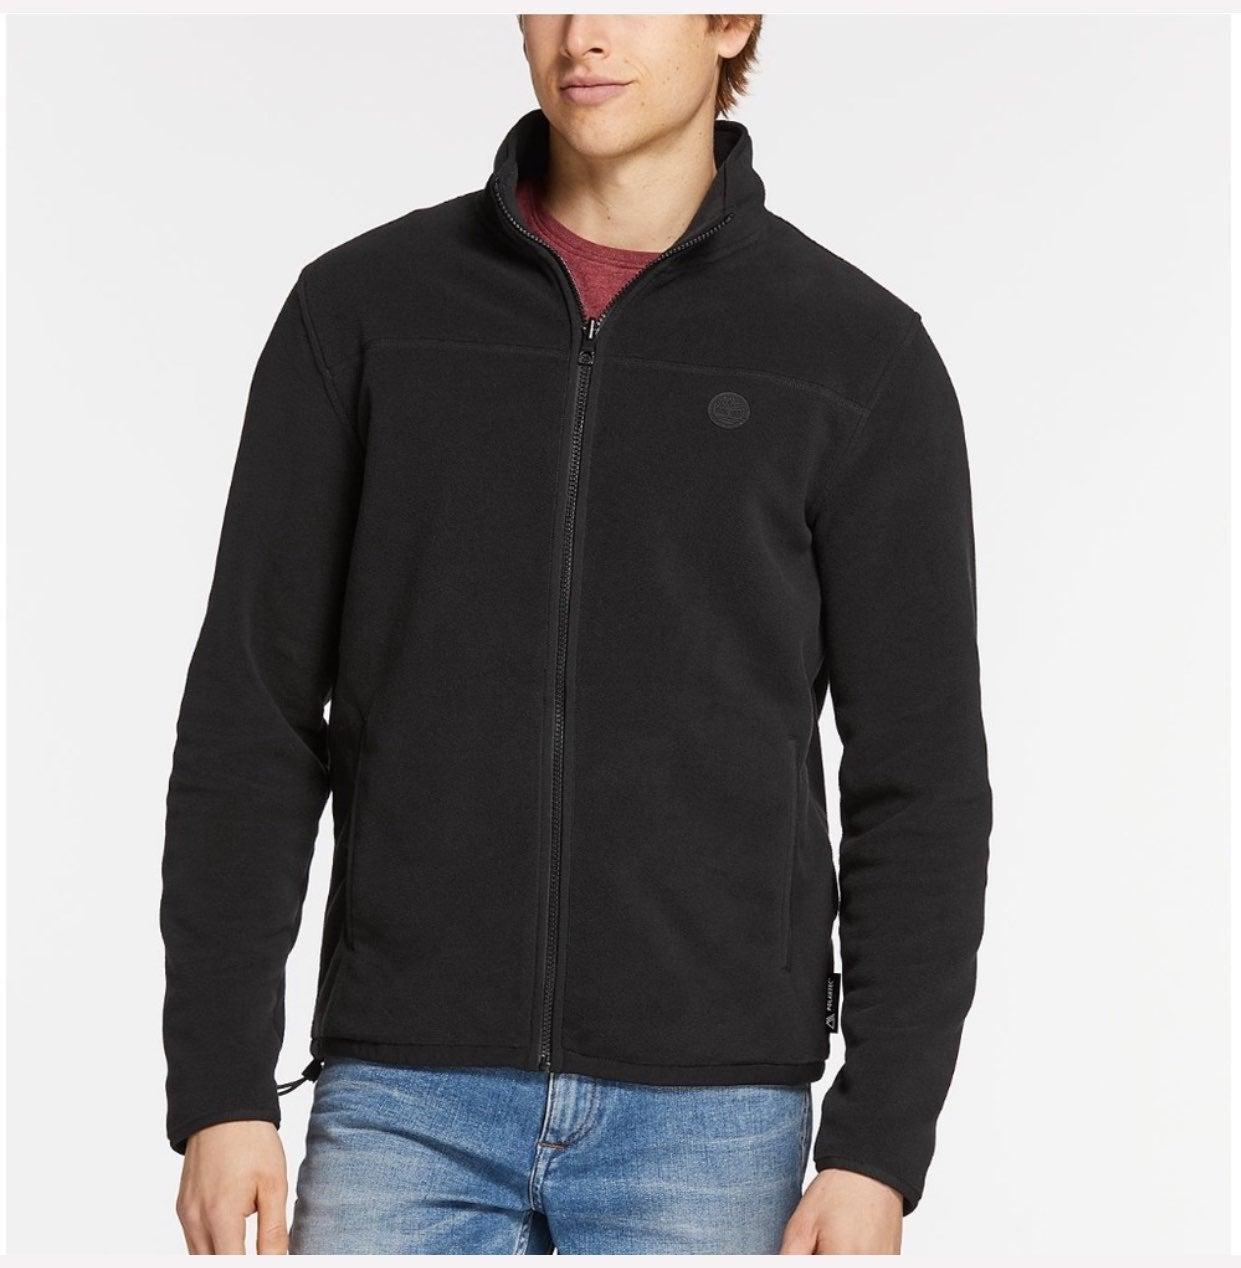 Timberland Essential Fleece Jacket